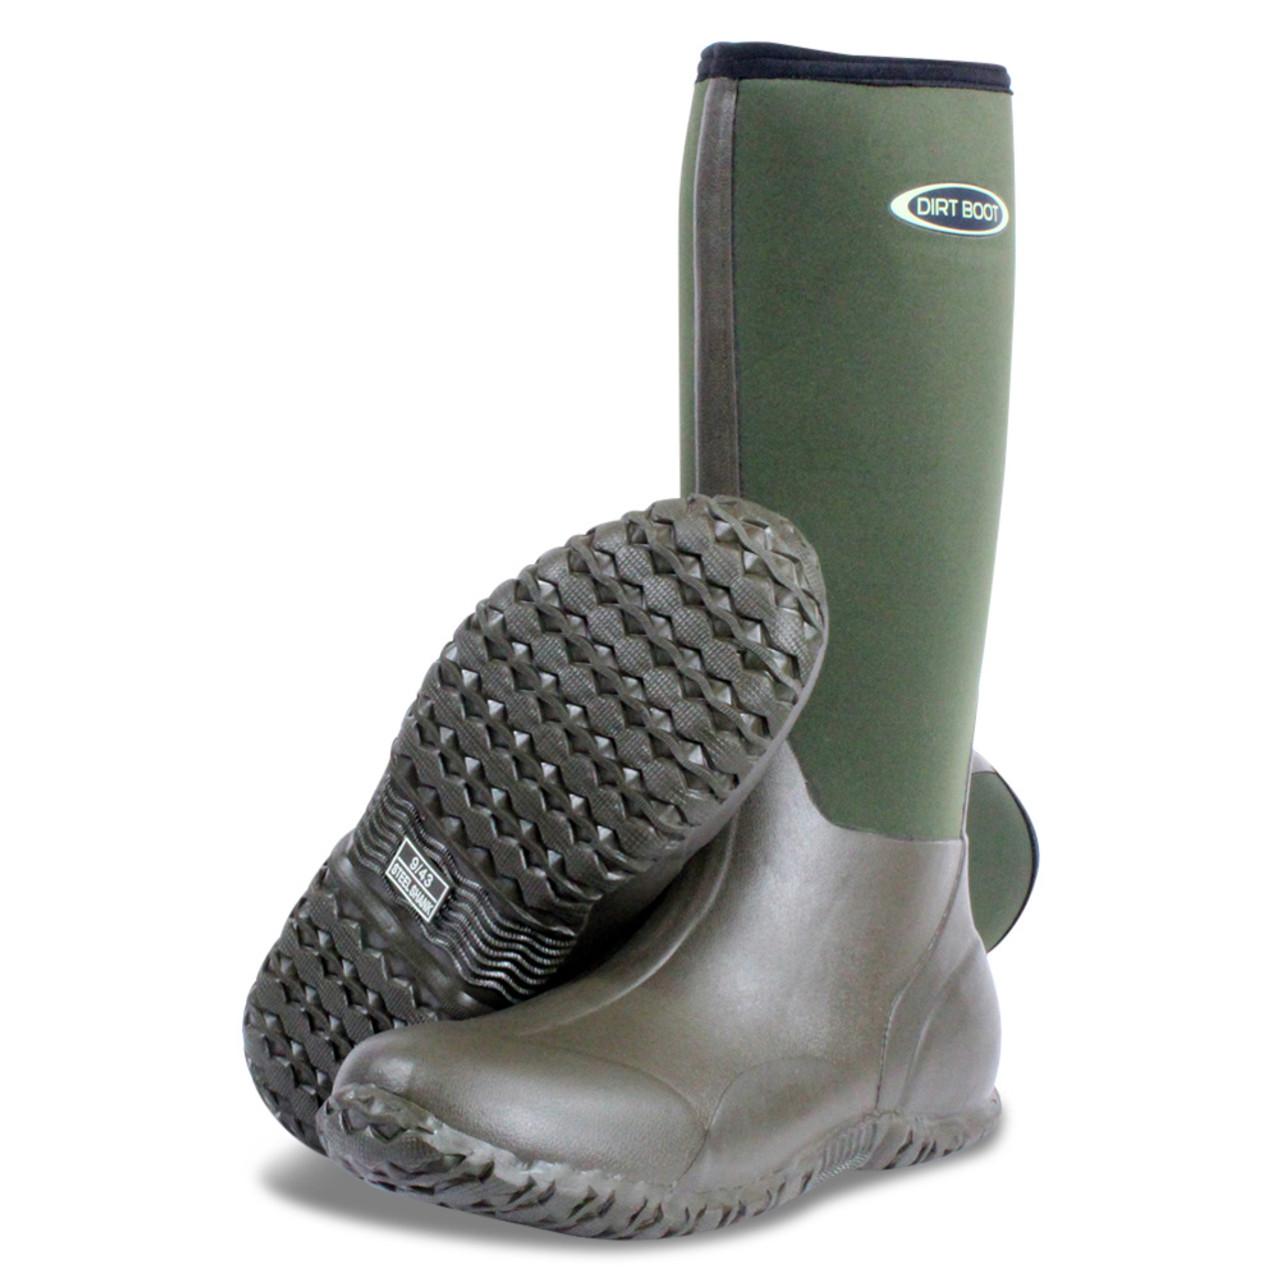 Dirt, Boot, Neoprene, Wellington, Muck, Field, Boot, wellies,